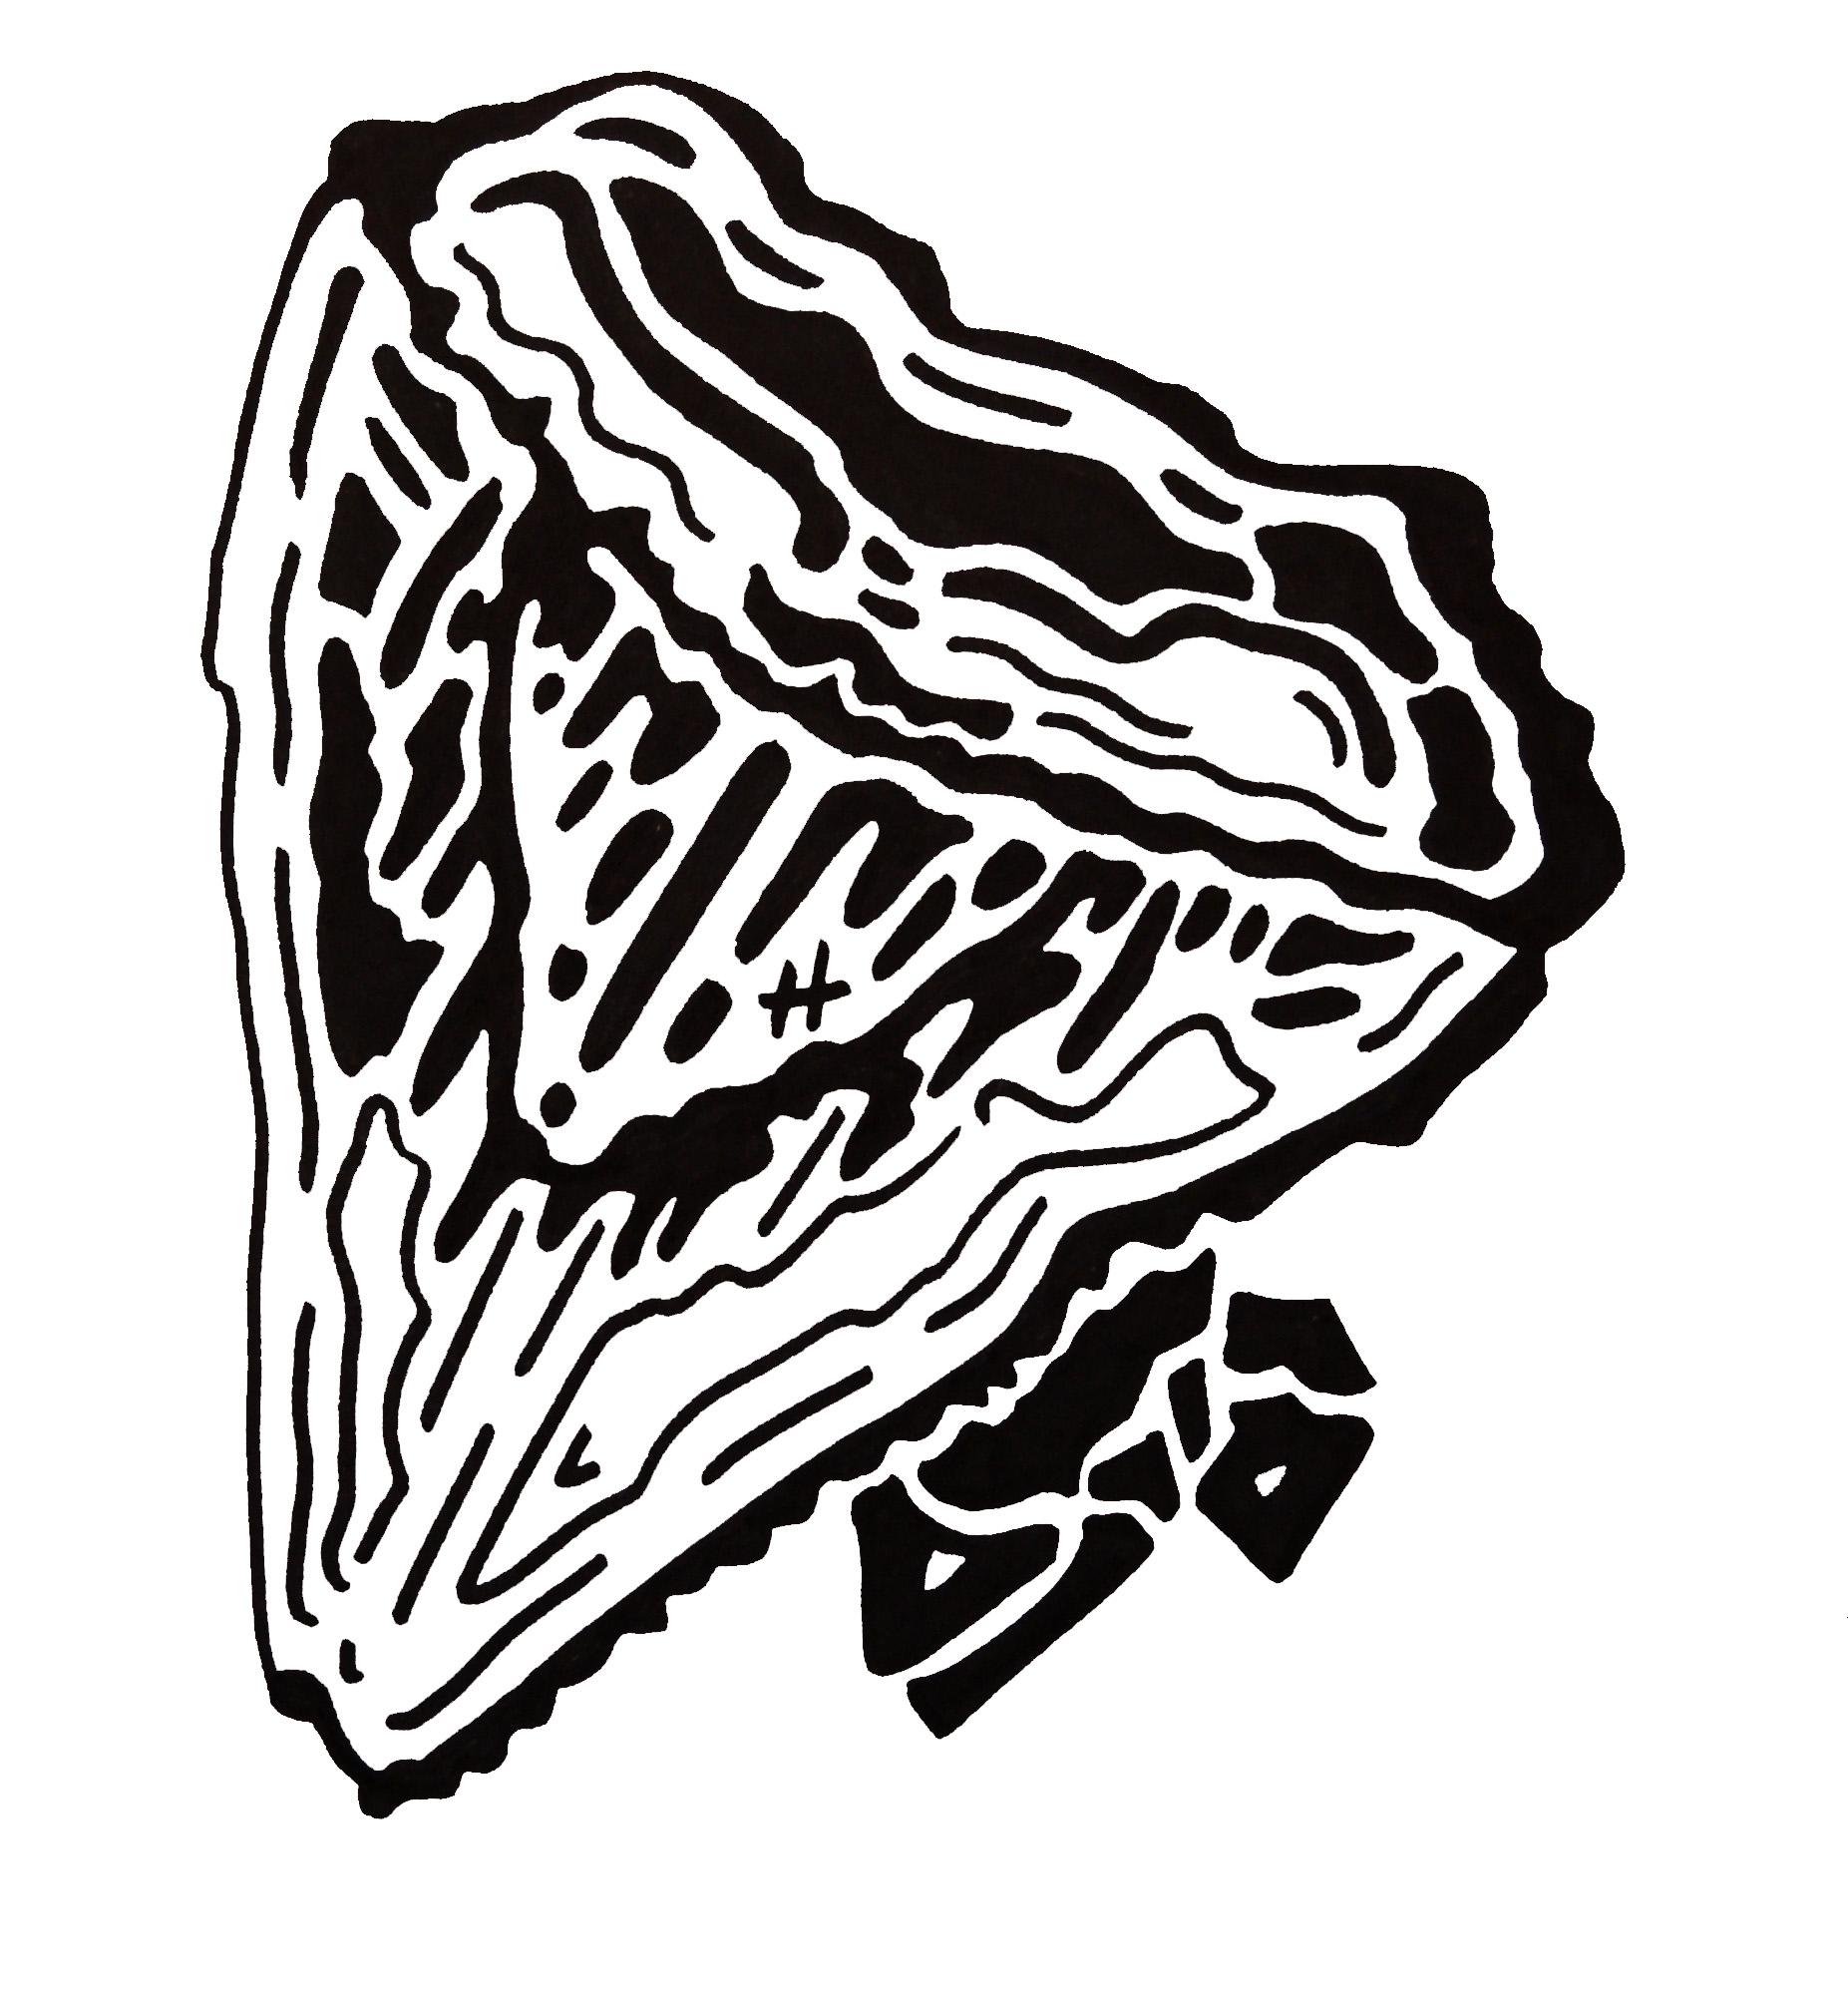 1853x2000 February Fossils Tricia Design